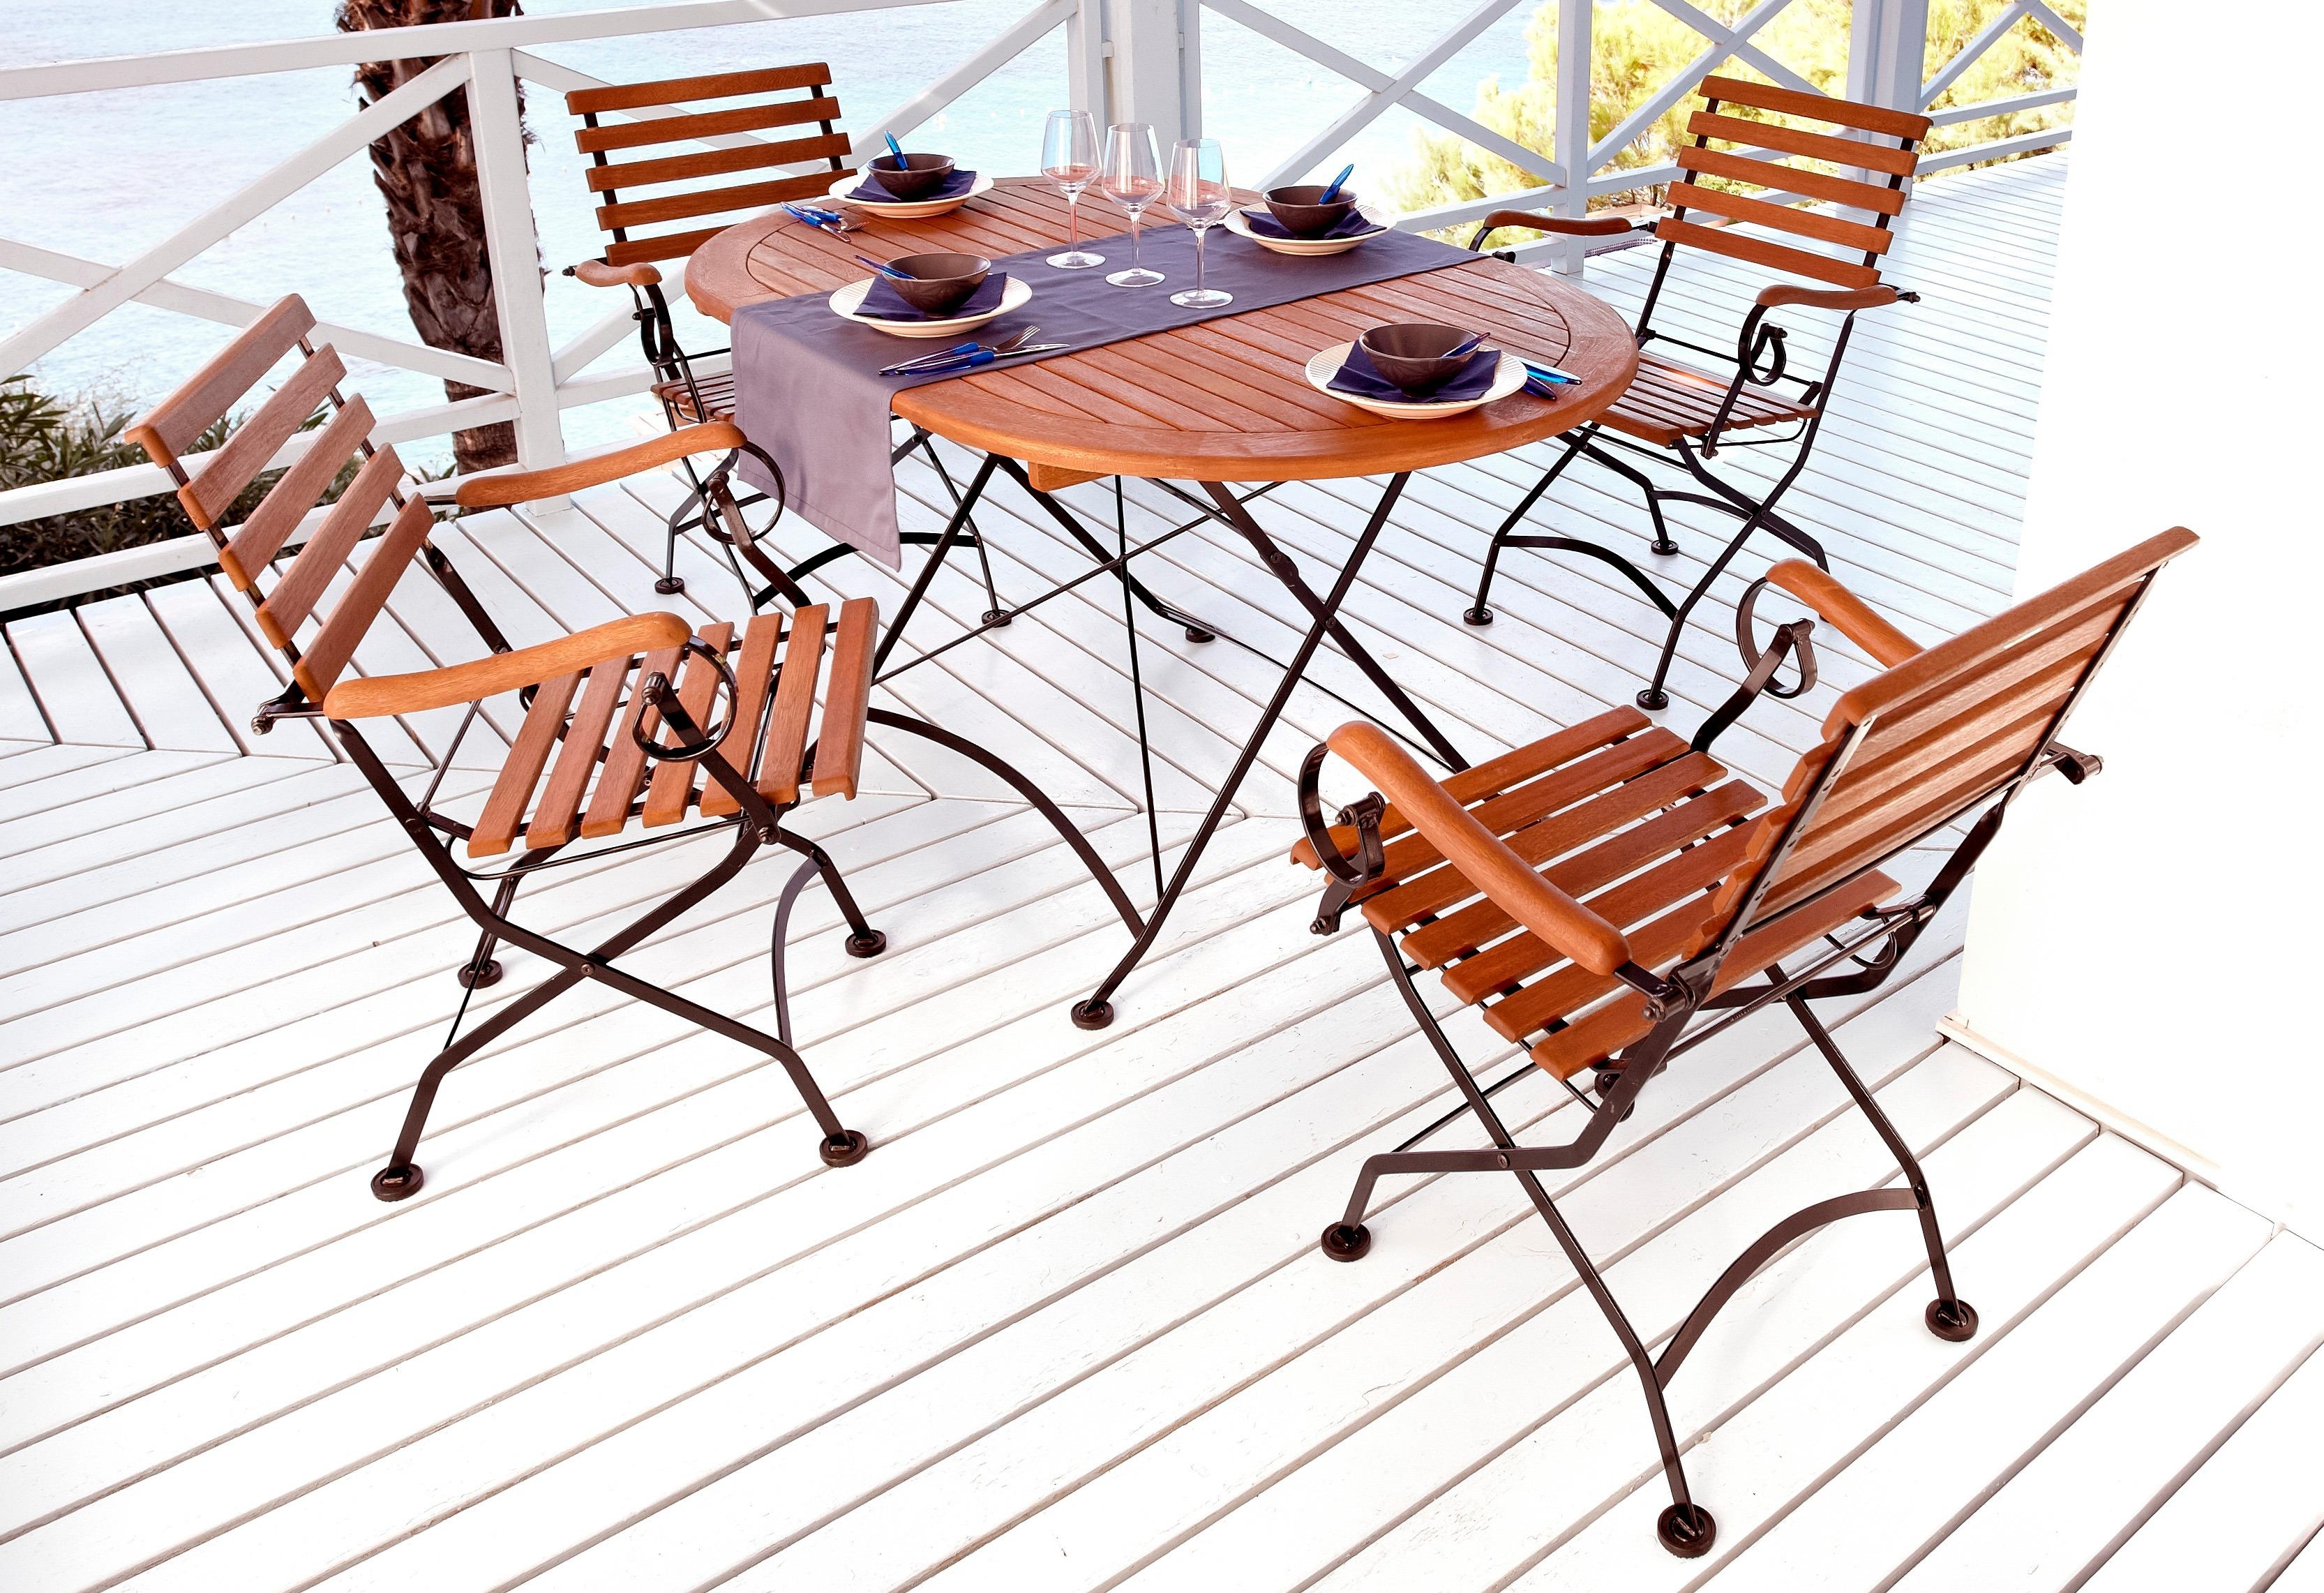 MERXX Sparset: Gartenmöbelset Schlossgarten 5-tlg 4 Sesselovaler Tisch 140x90 cm Stahl/Eukalyptus